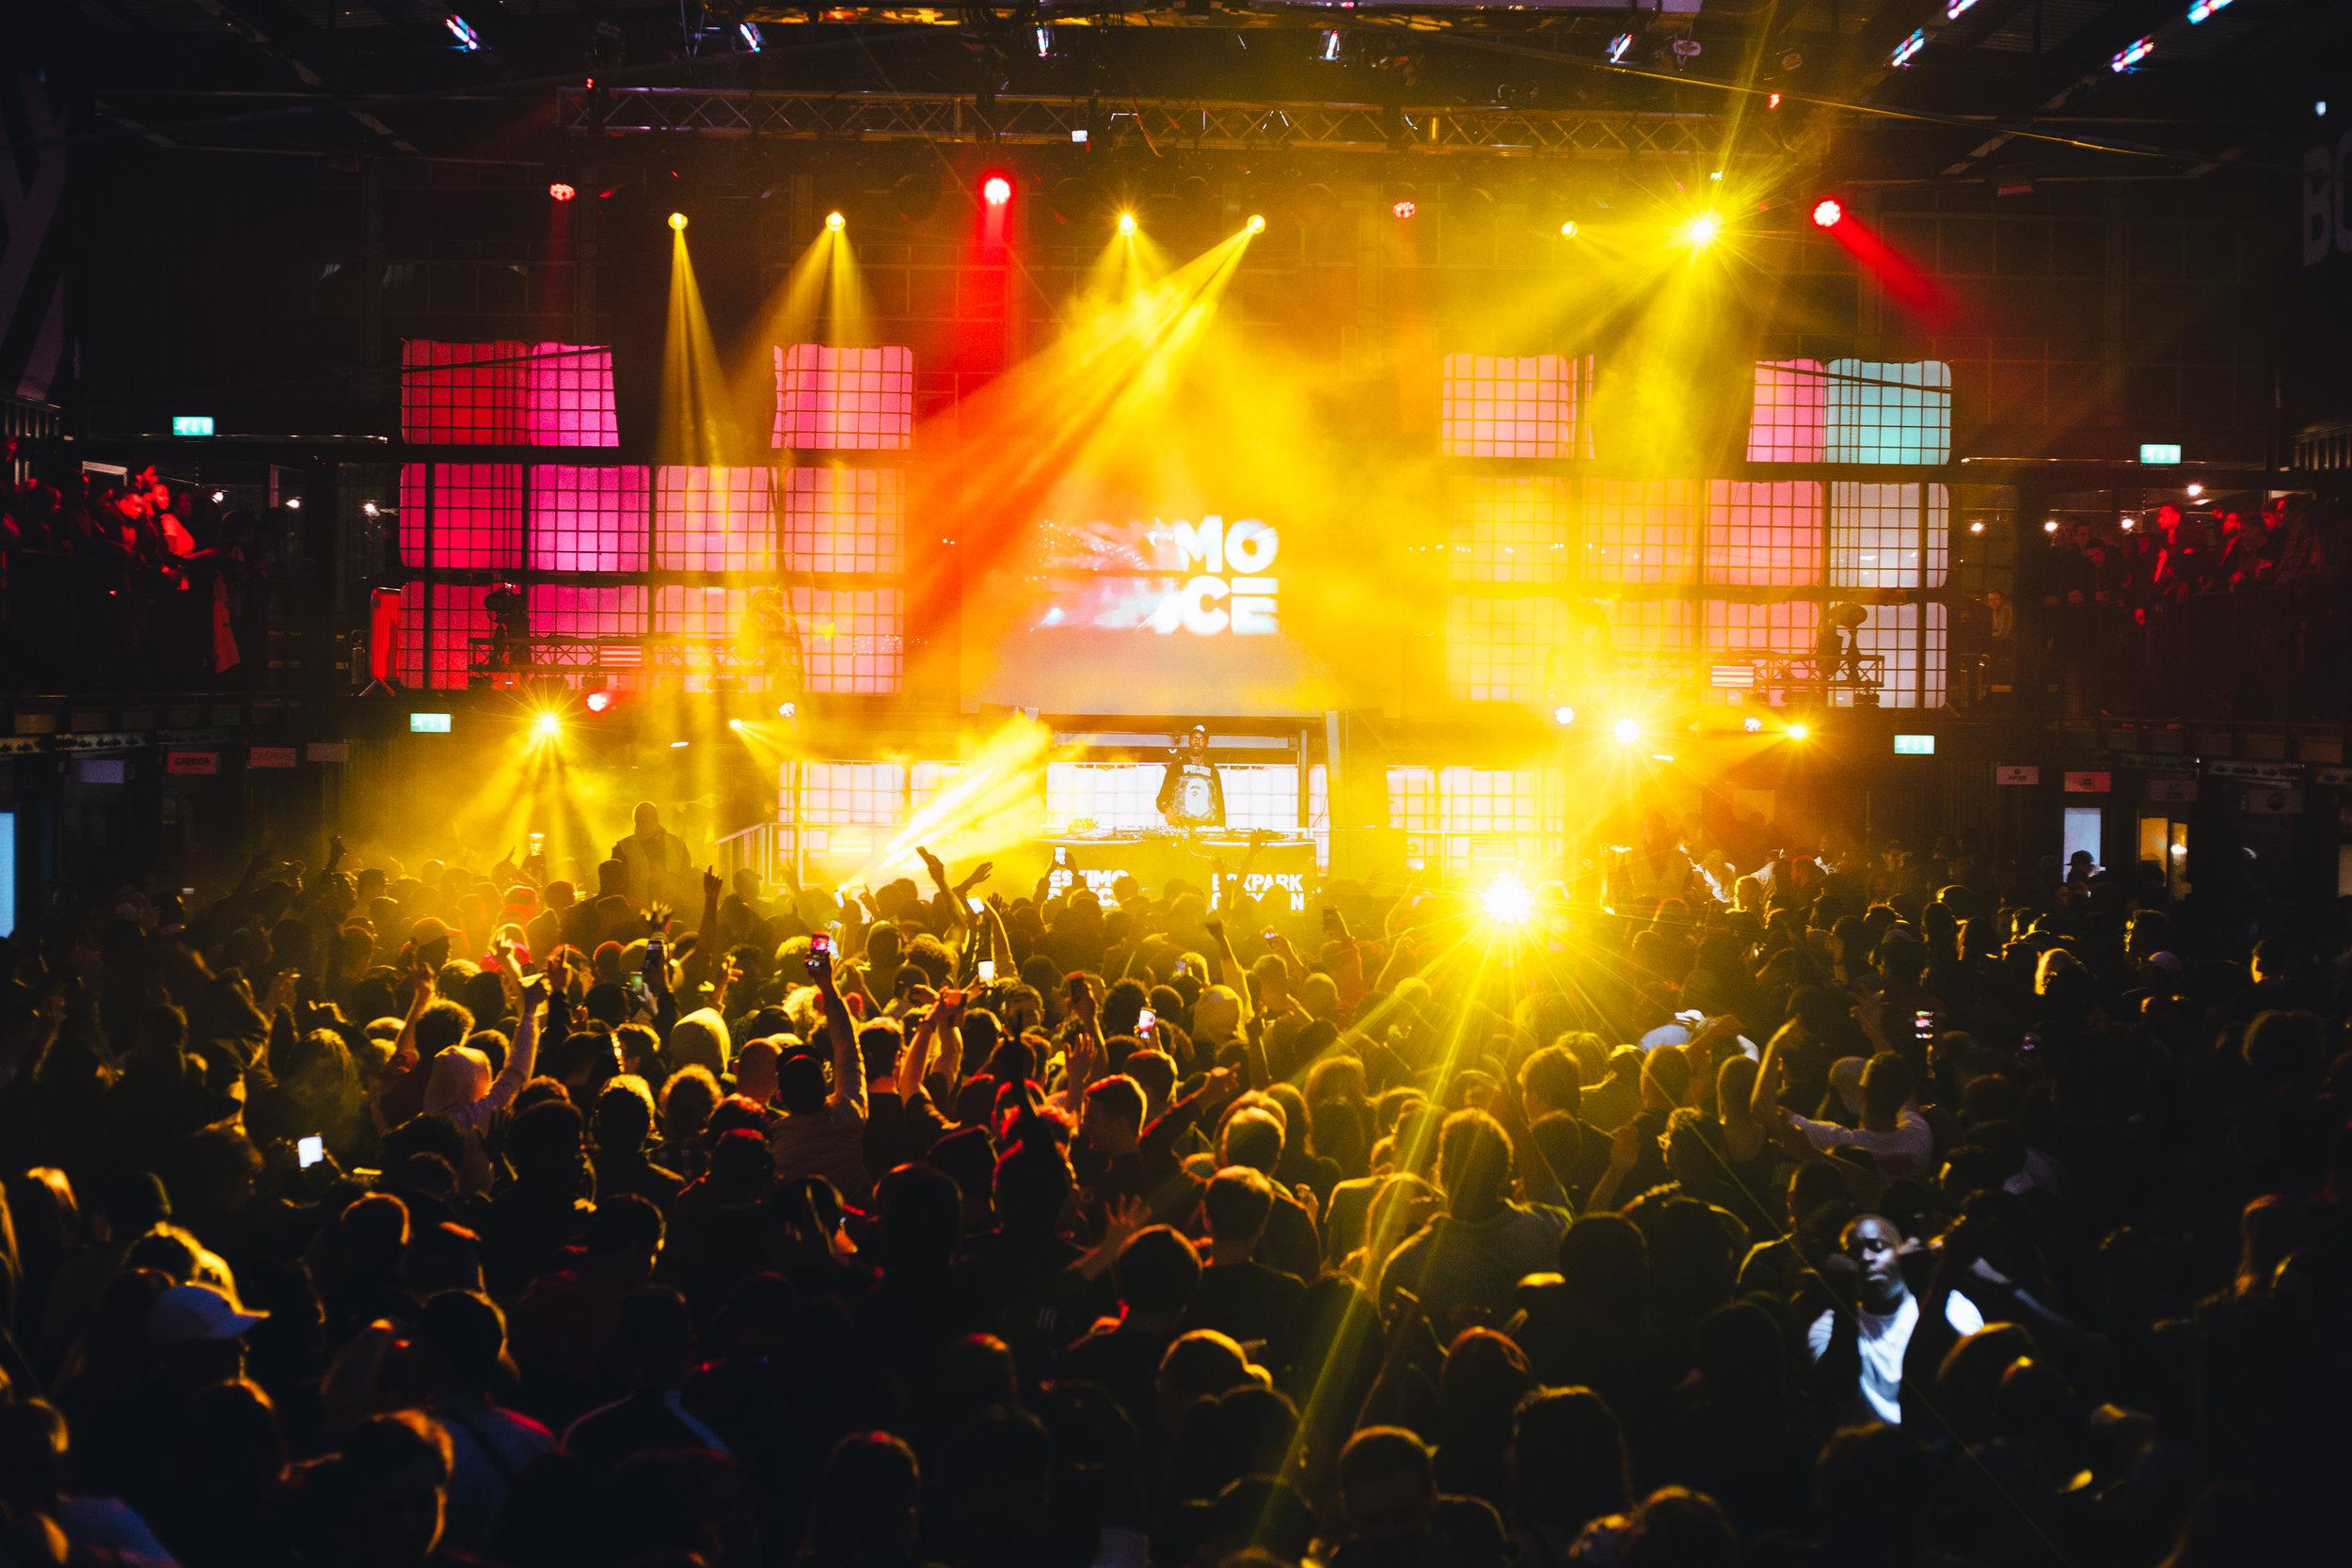 HOTBOX Live Music Venue in Croydon South London Club Card 11.jpg